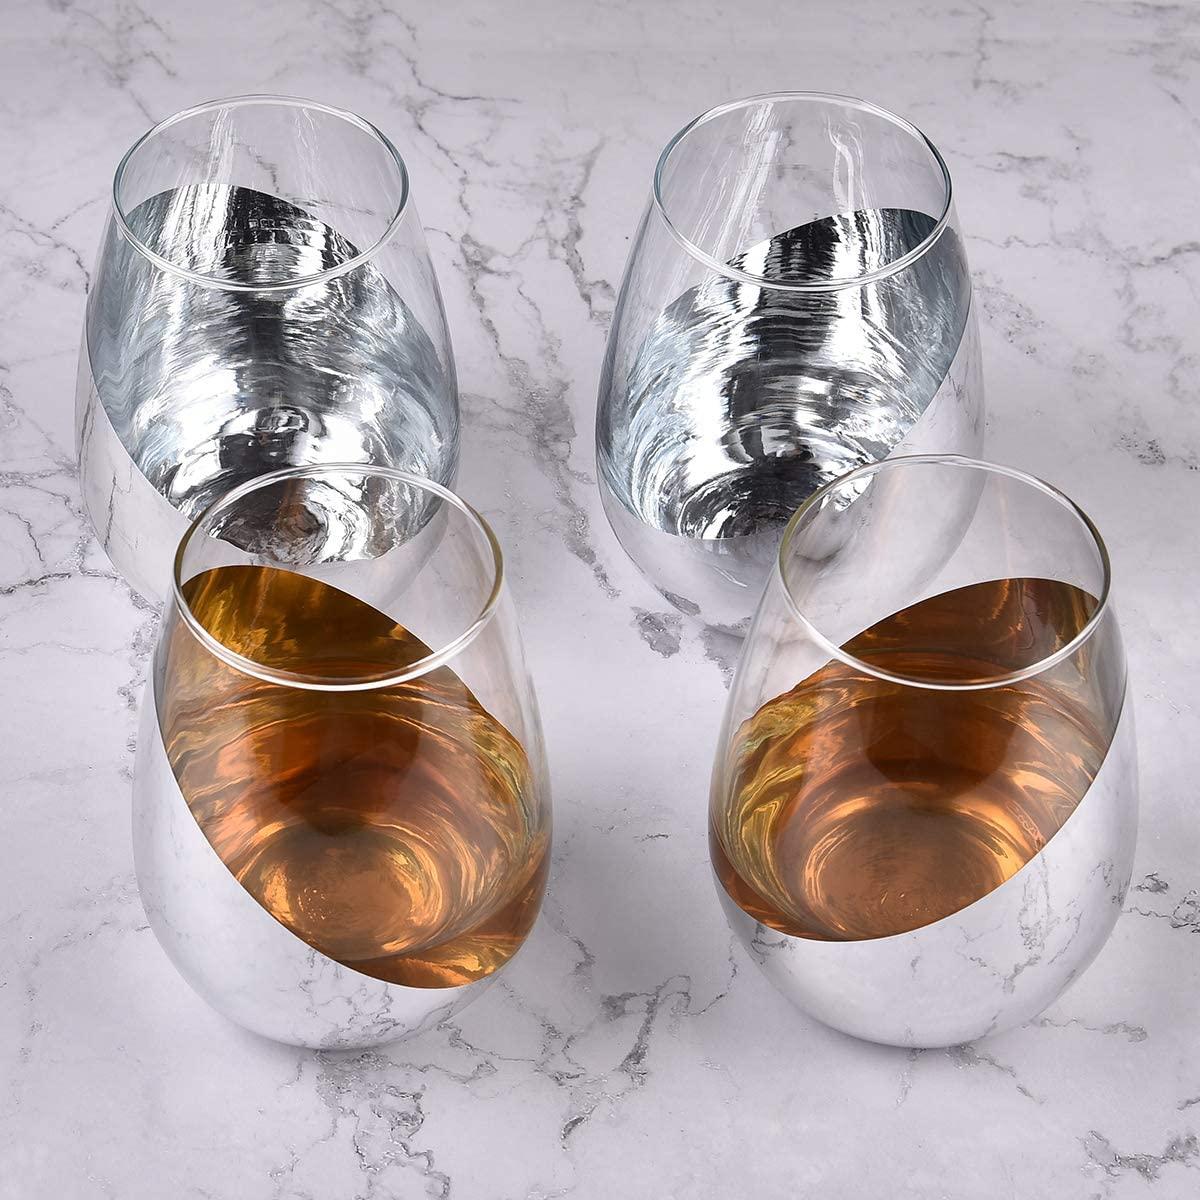 Modern Silver Stemless Wine Glasses, Set of 4 Half Silver Plated Wine Glasses for Women Men Wine Lover, 15Oz